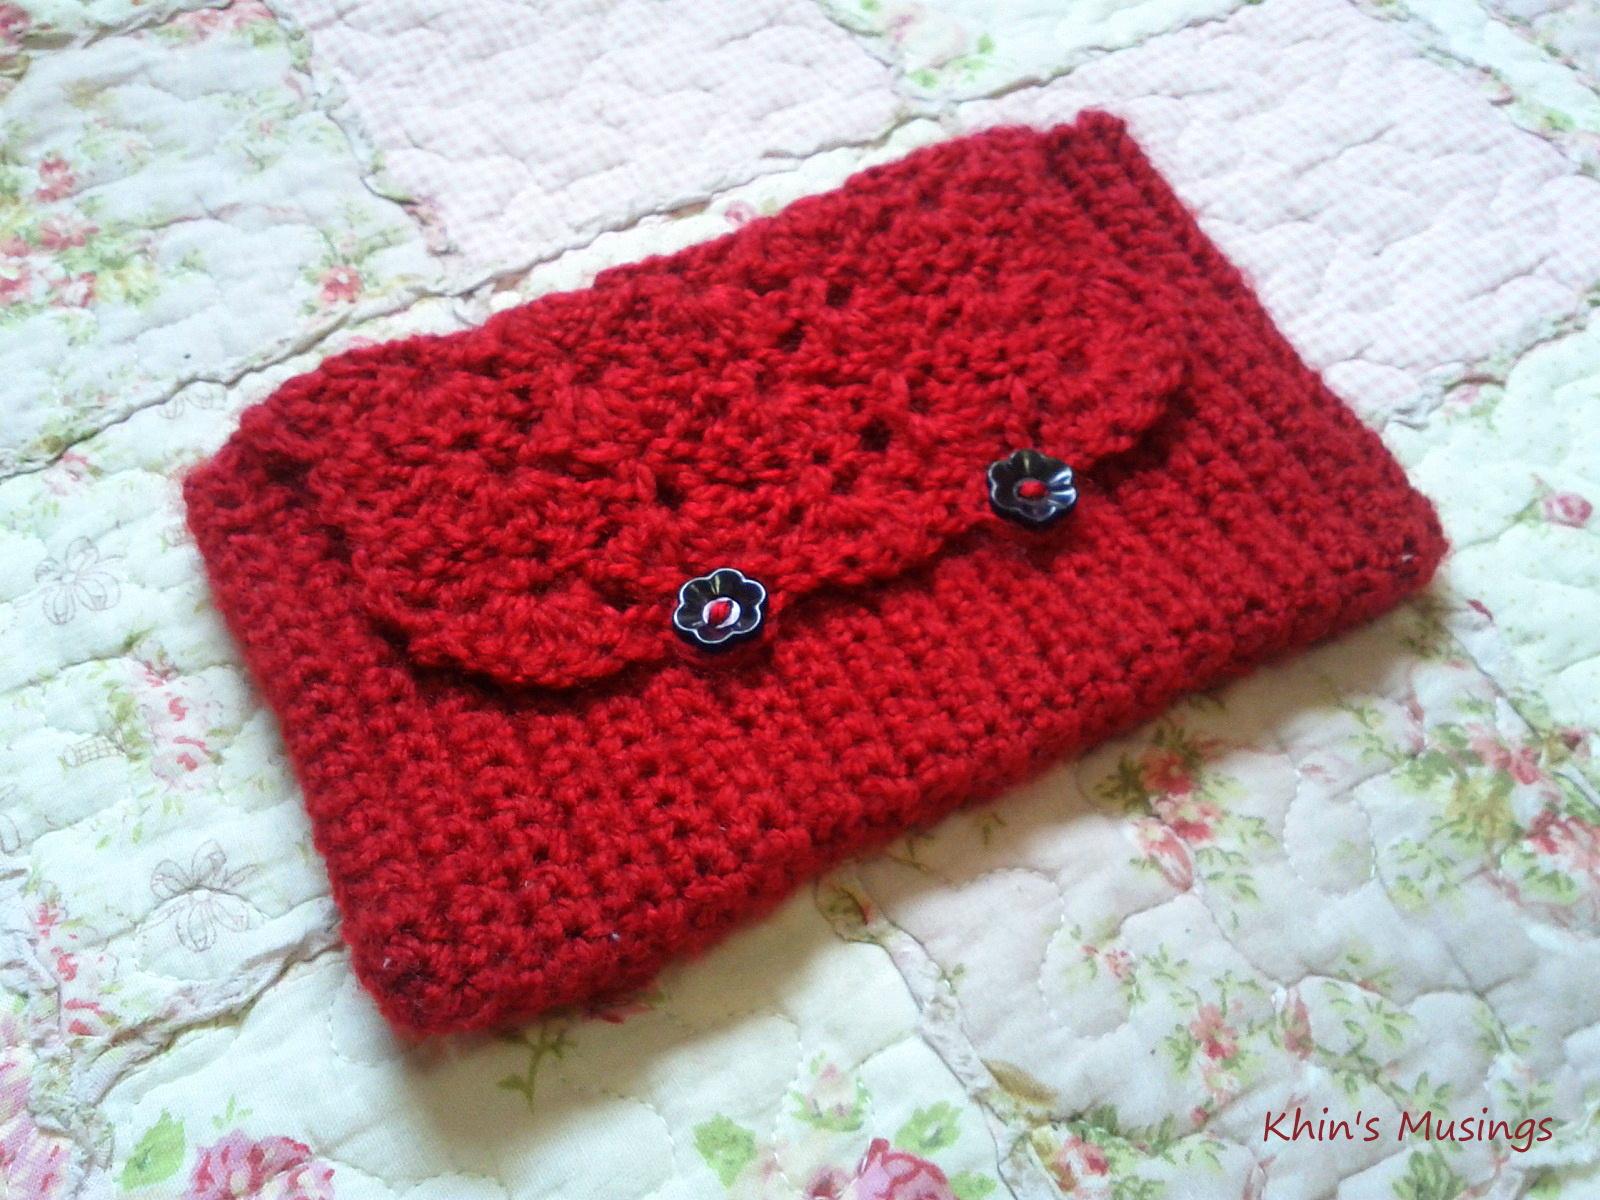 KhinsBoutique: My Crochet Red Pencil Case